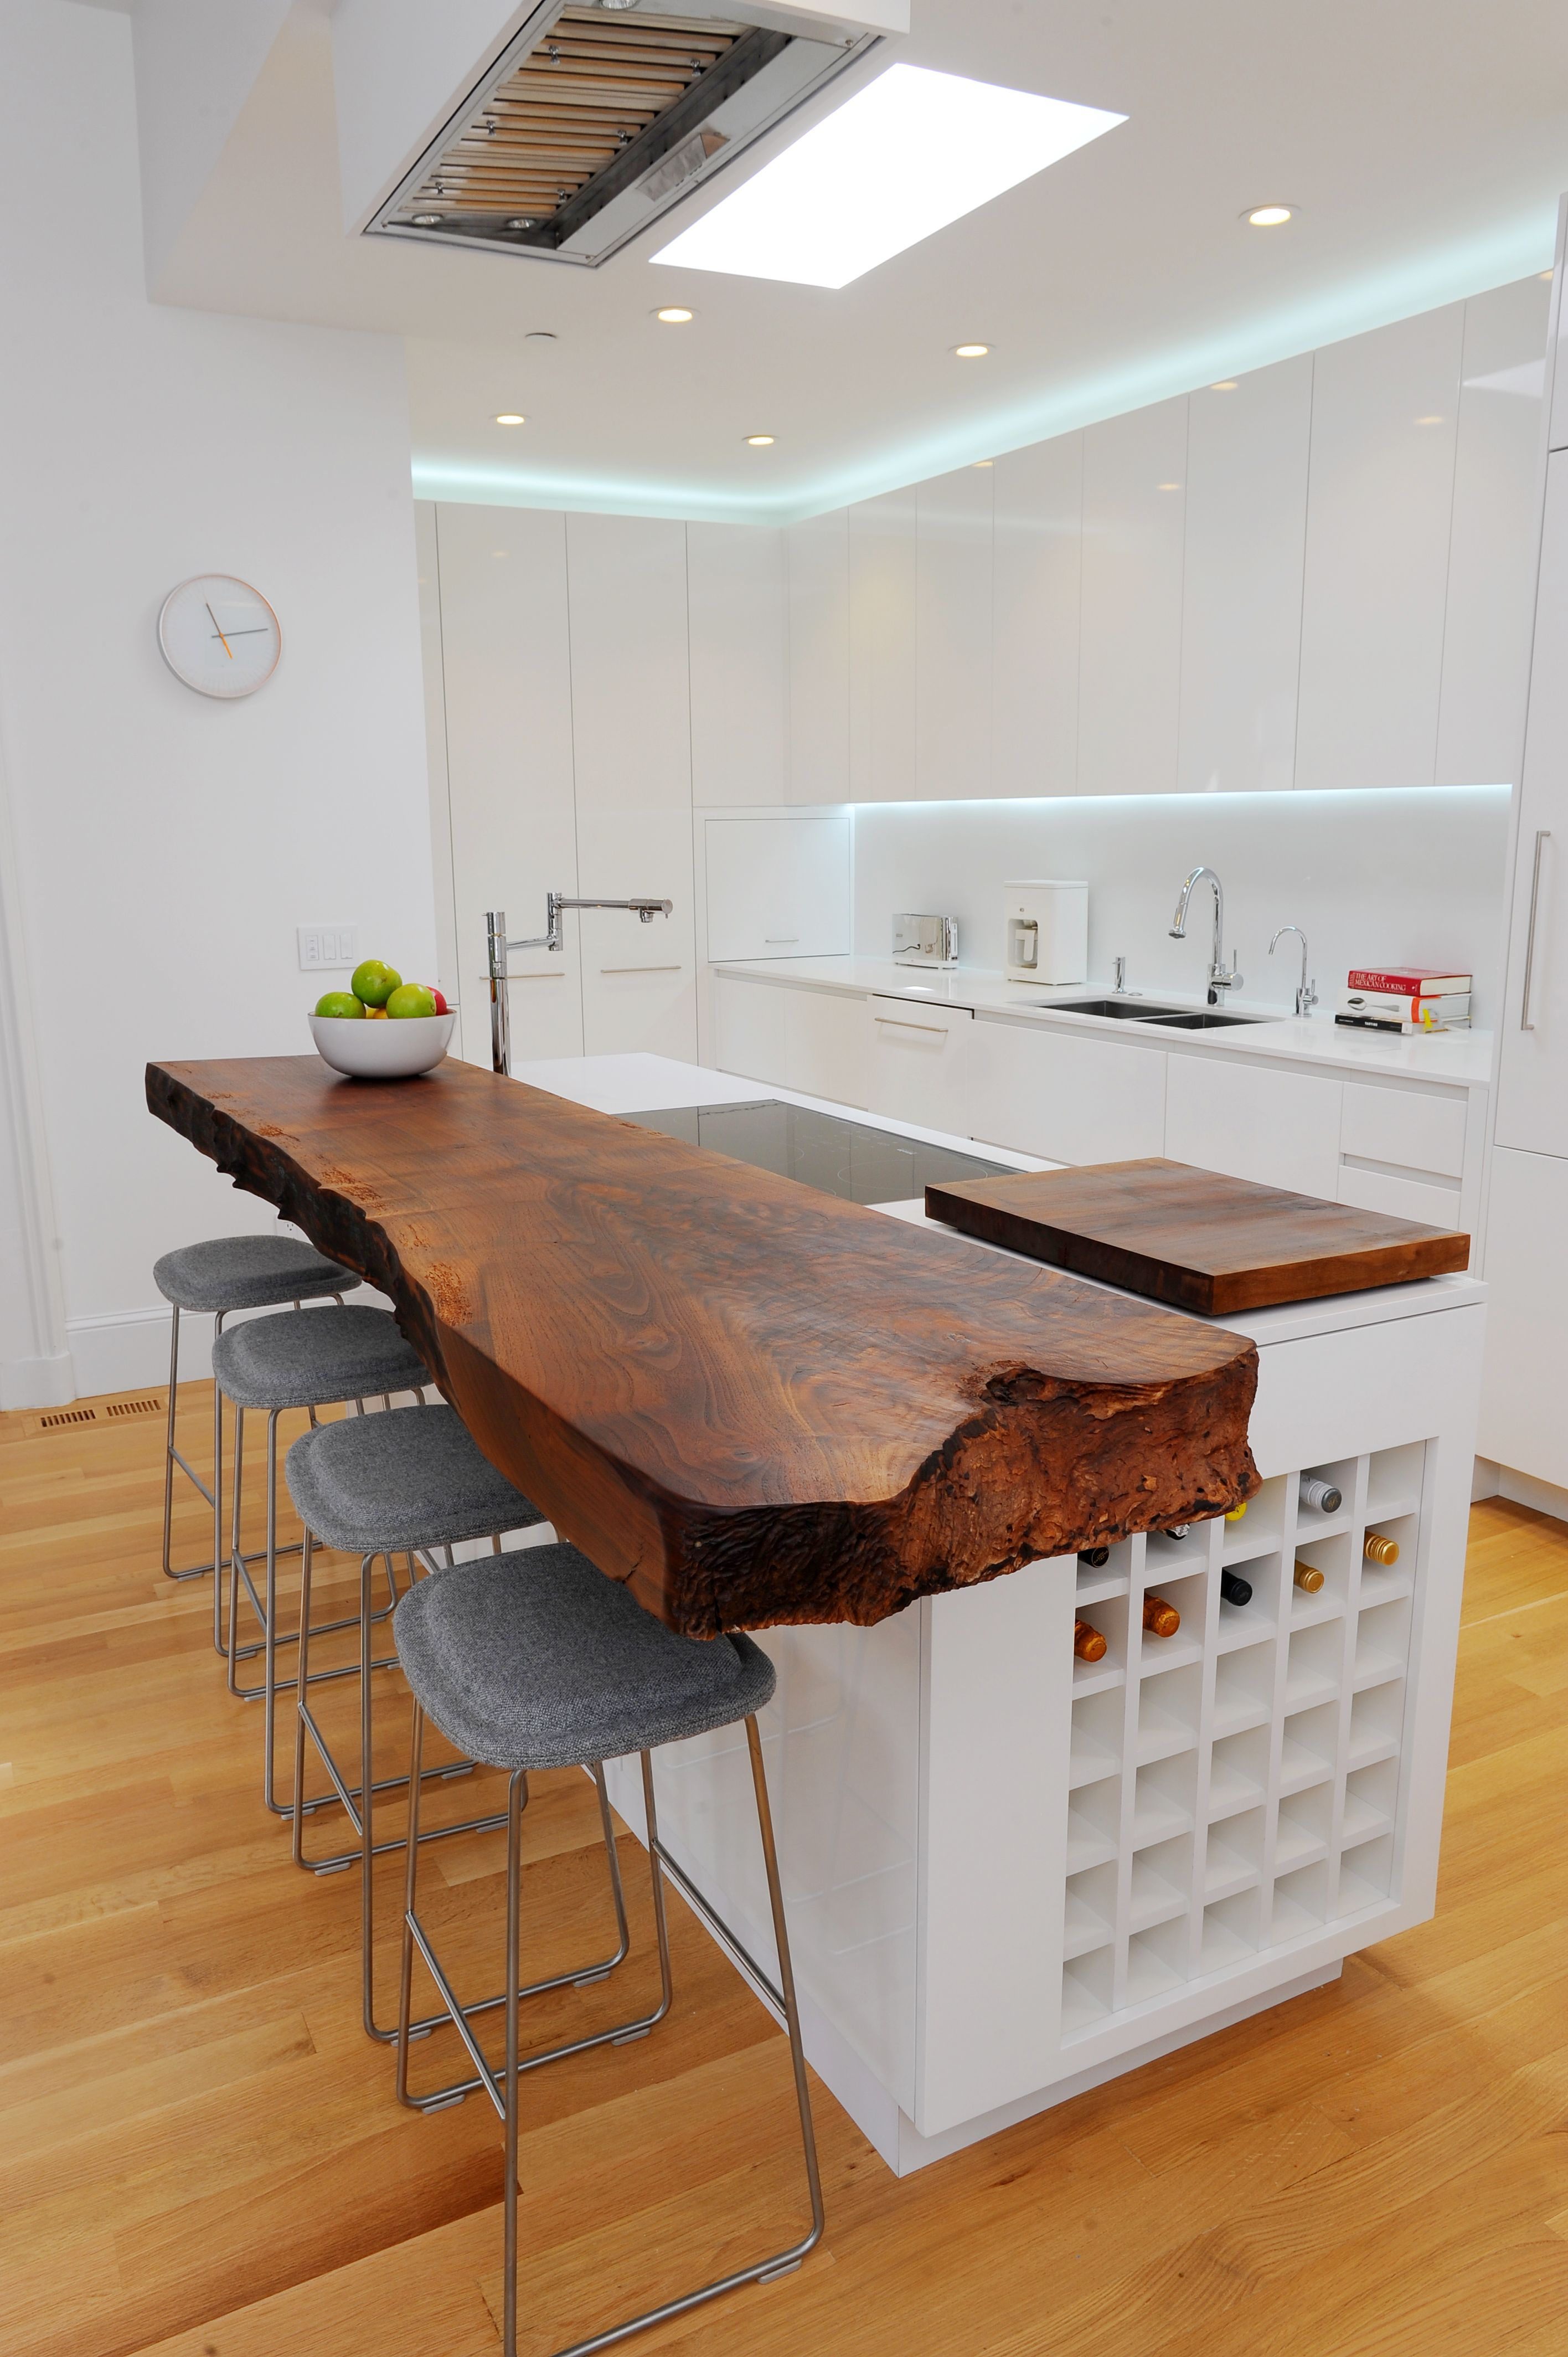 Haightashbury residence sf architecture kitchen design ideas